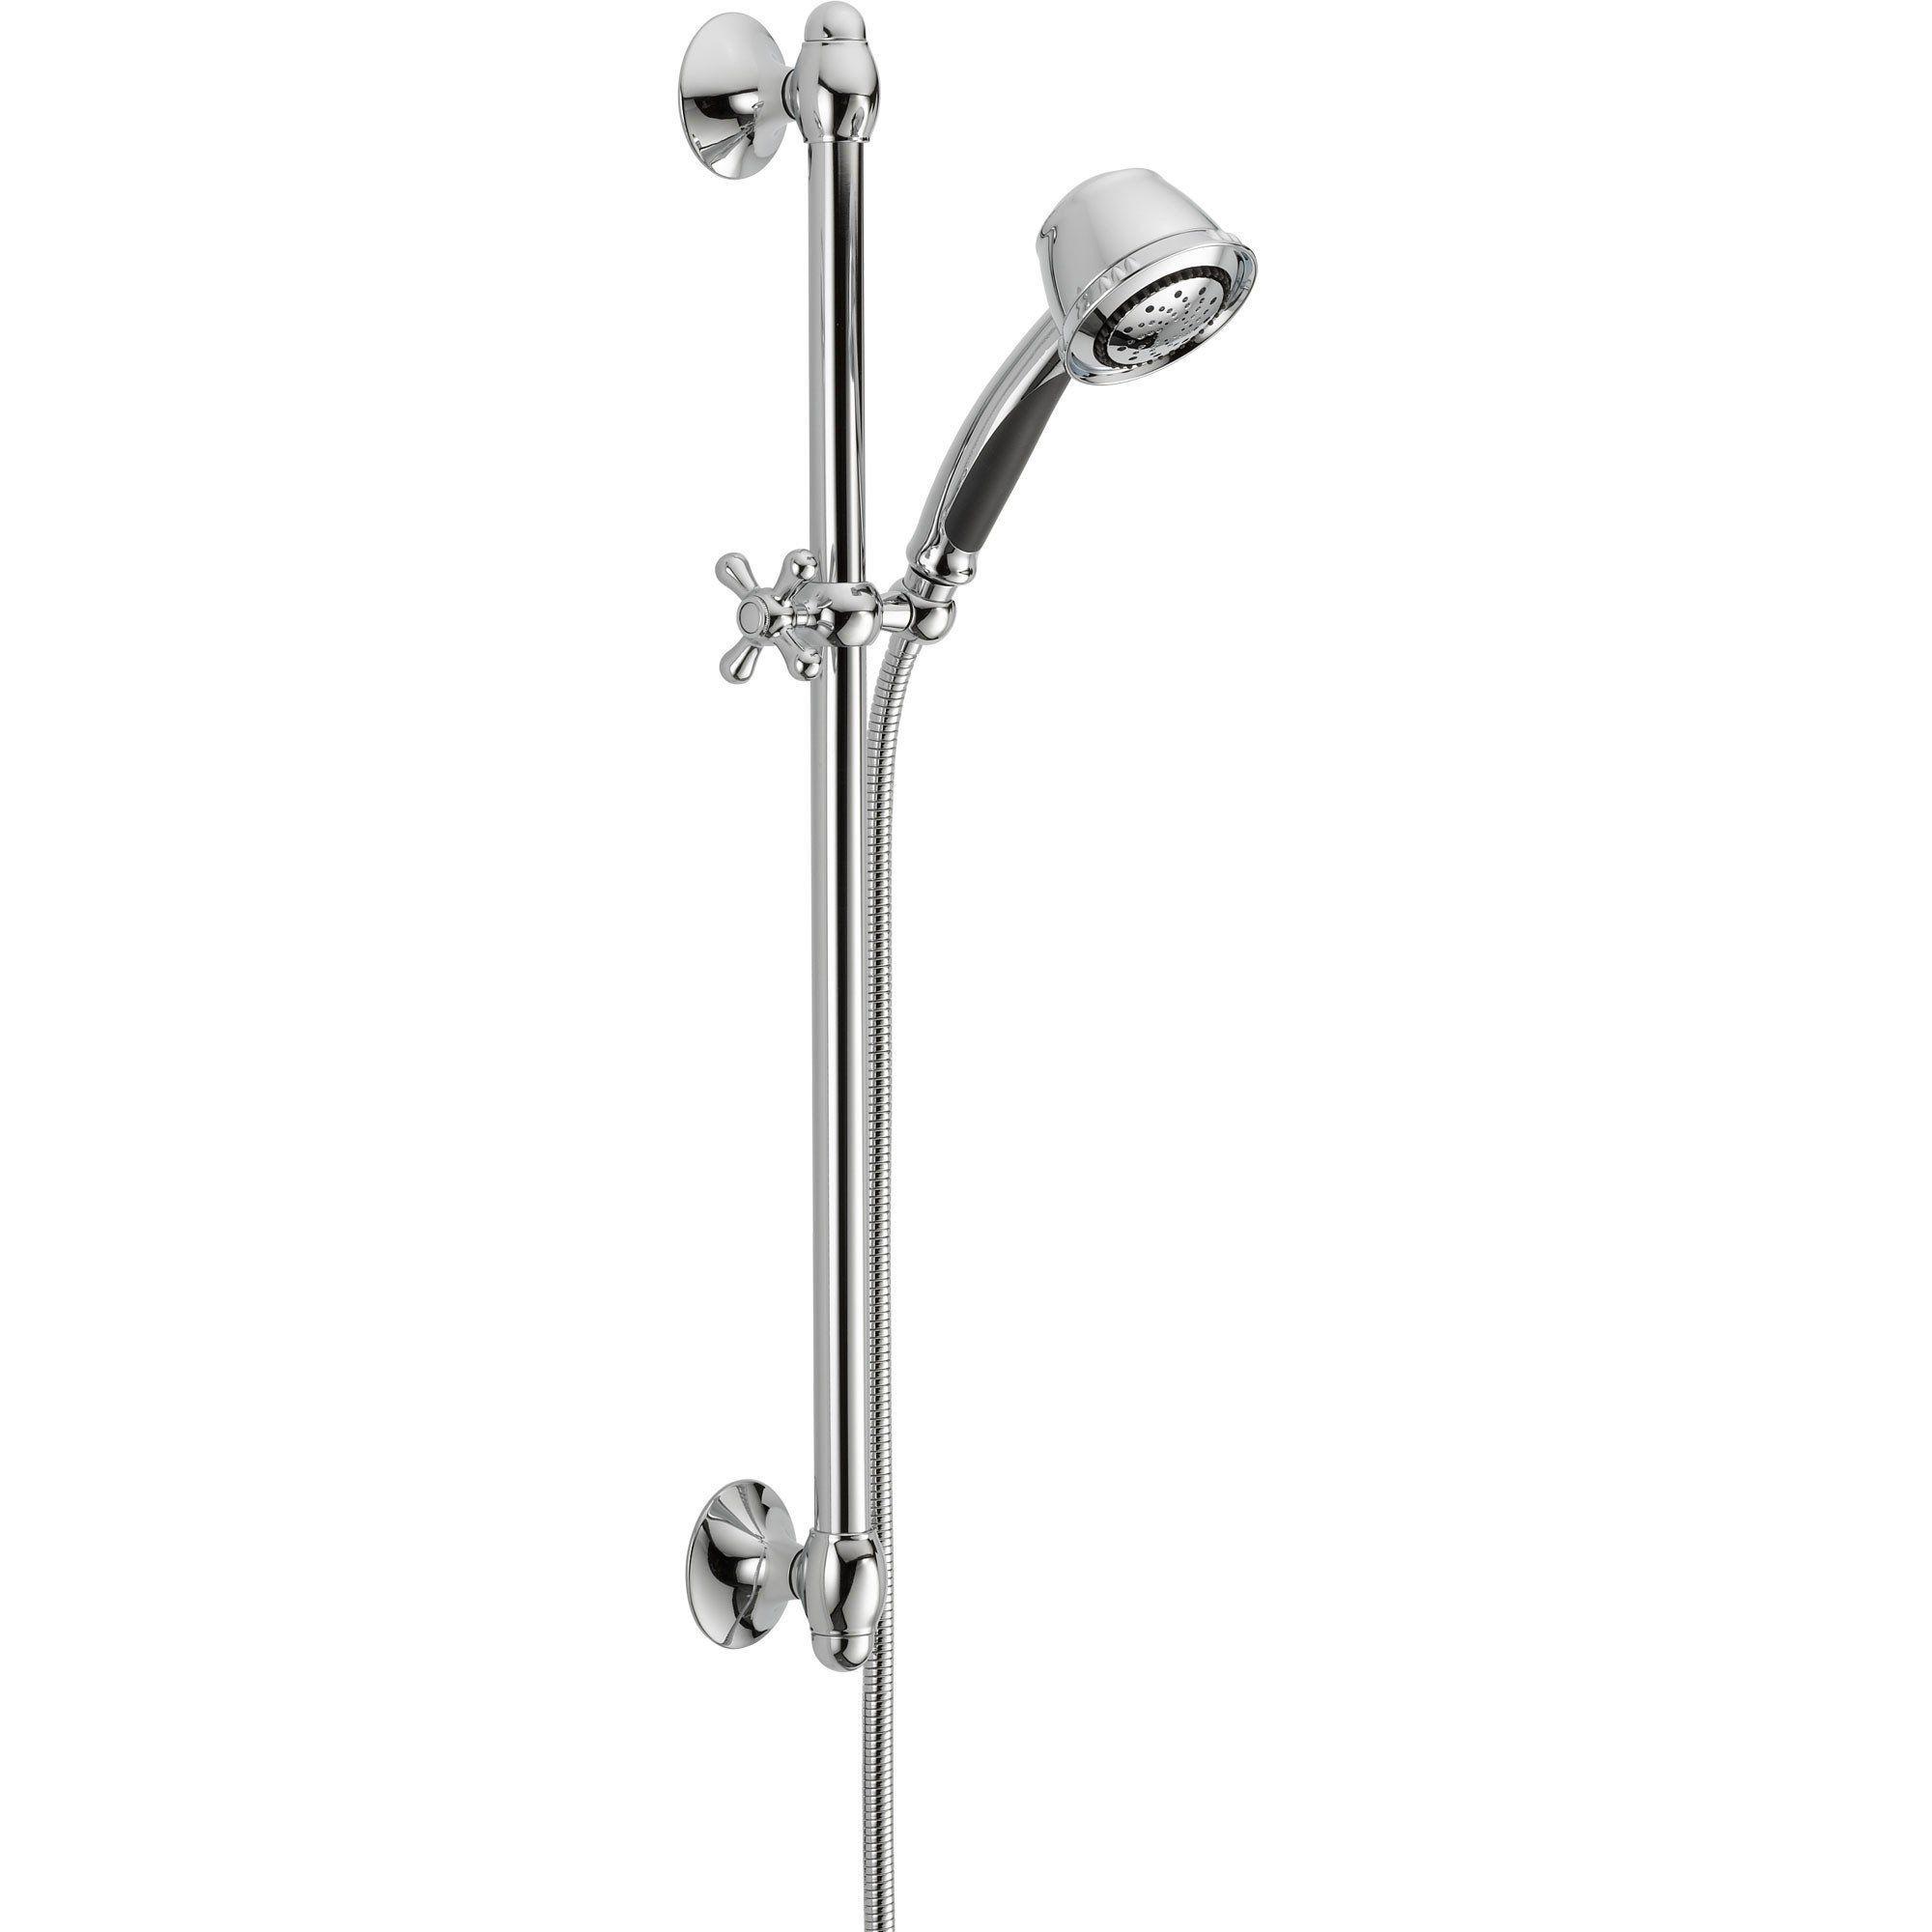 Delta 5 Spray Chrome Handheld Shower Head With Slide Bar 561052